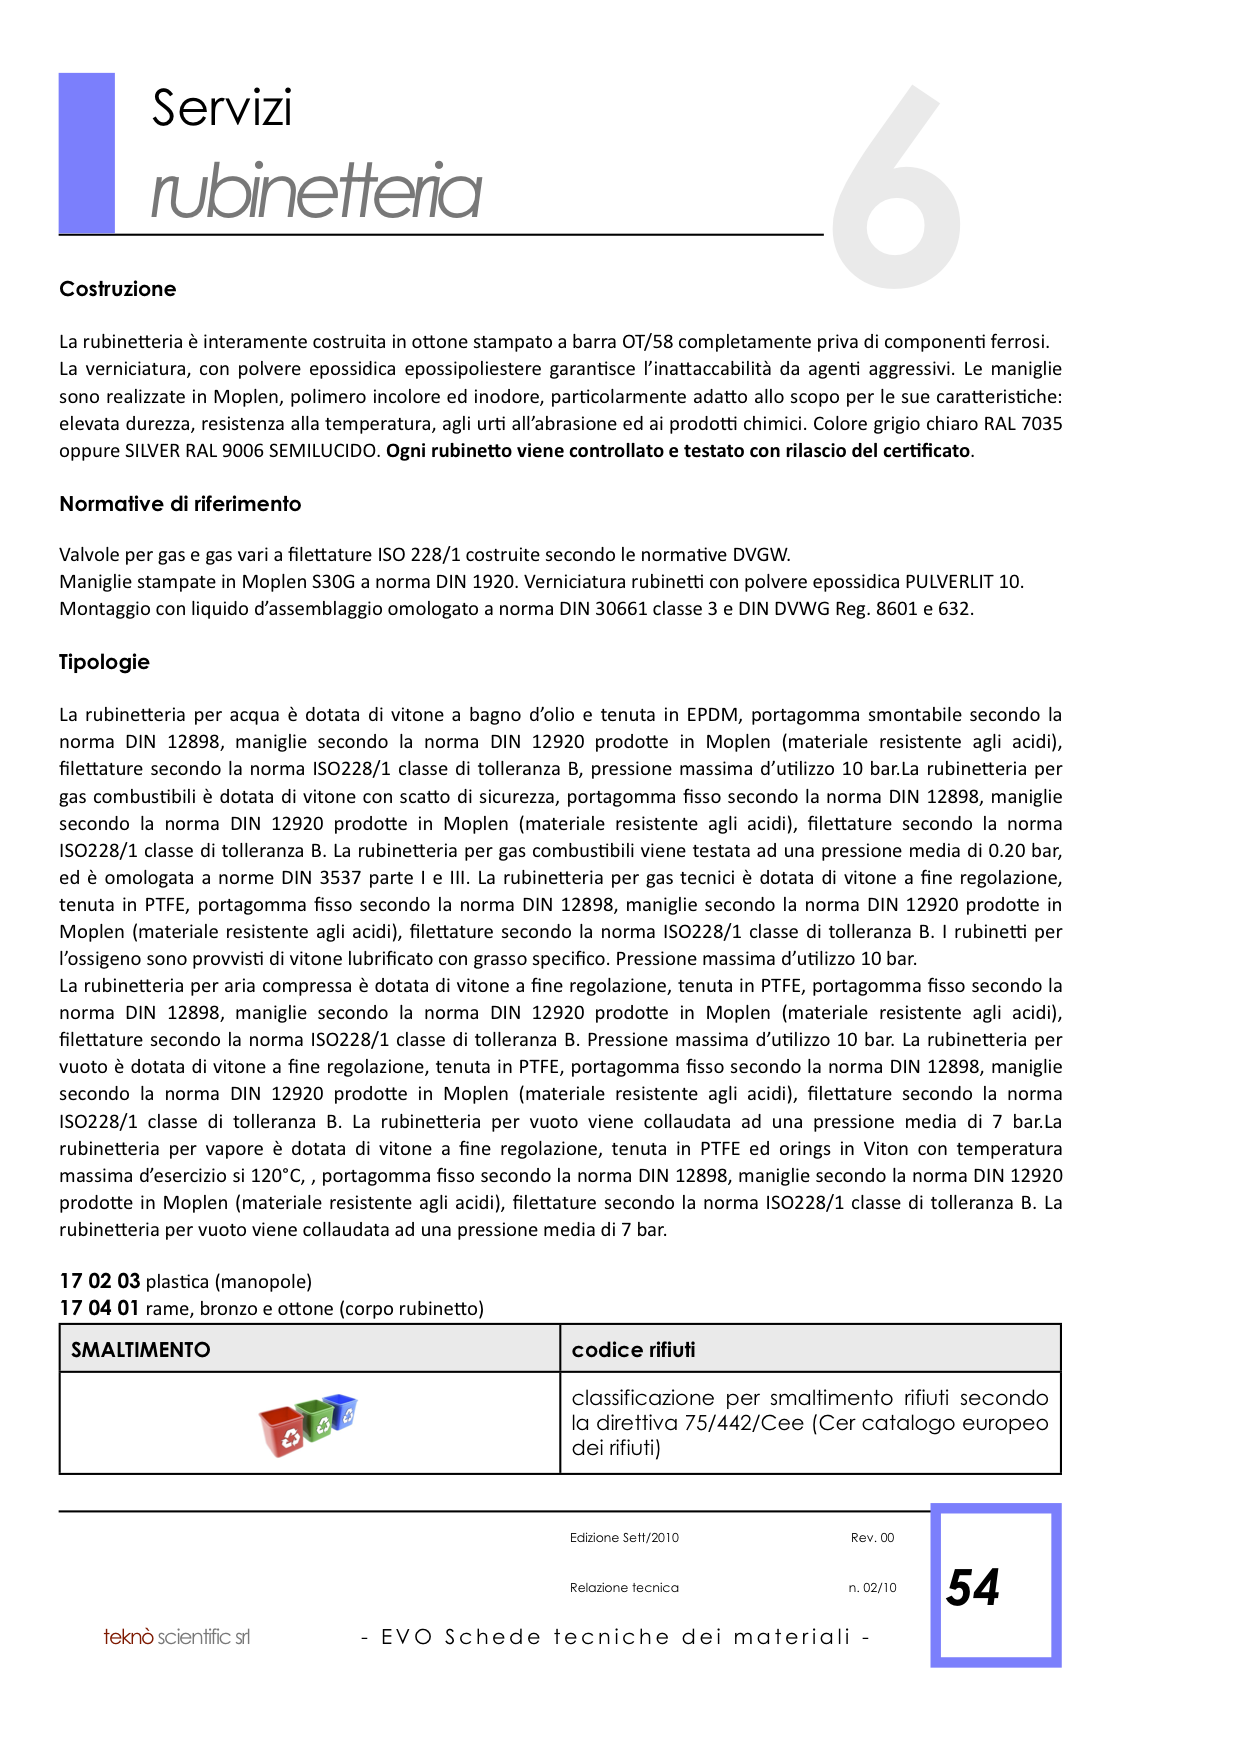 EVO Schede Tecniche materiali copia 15.png